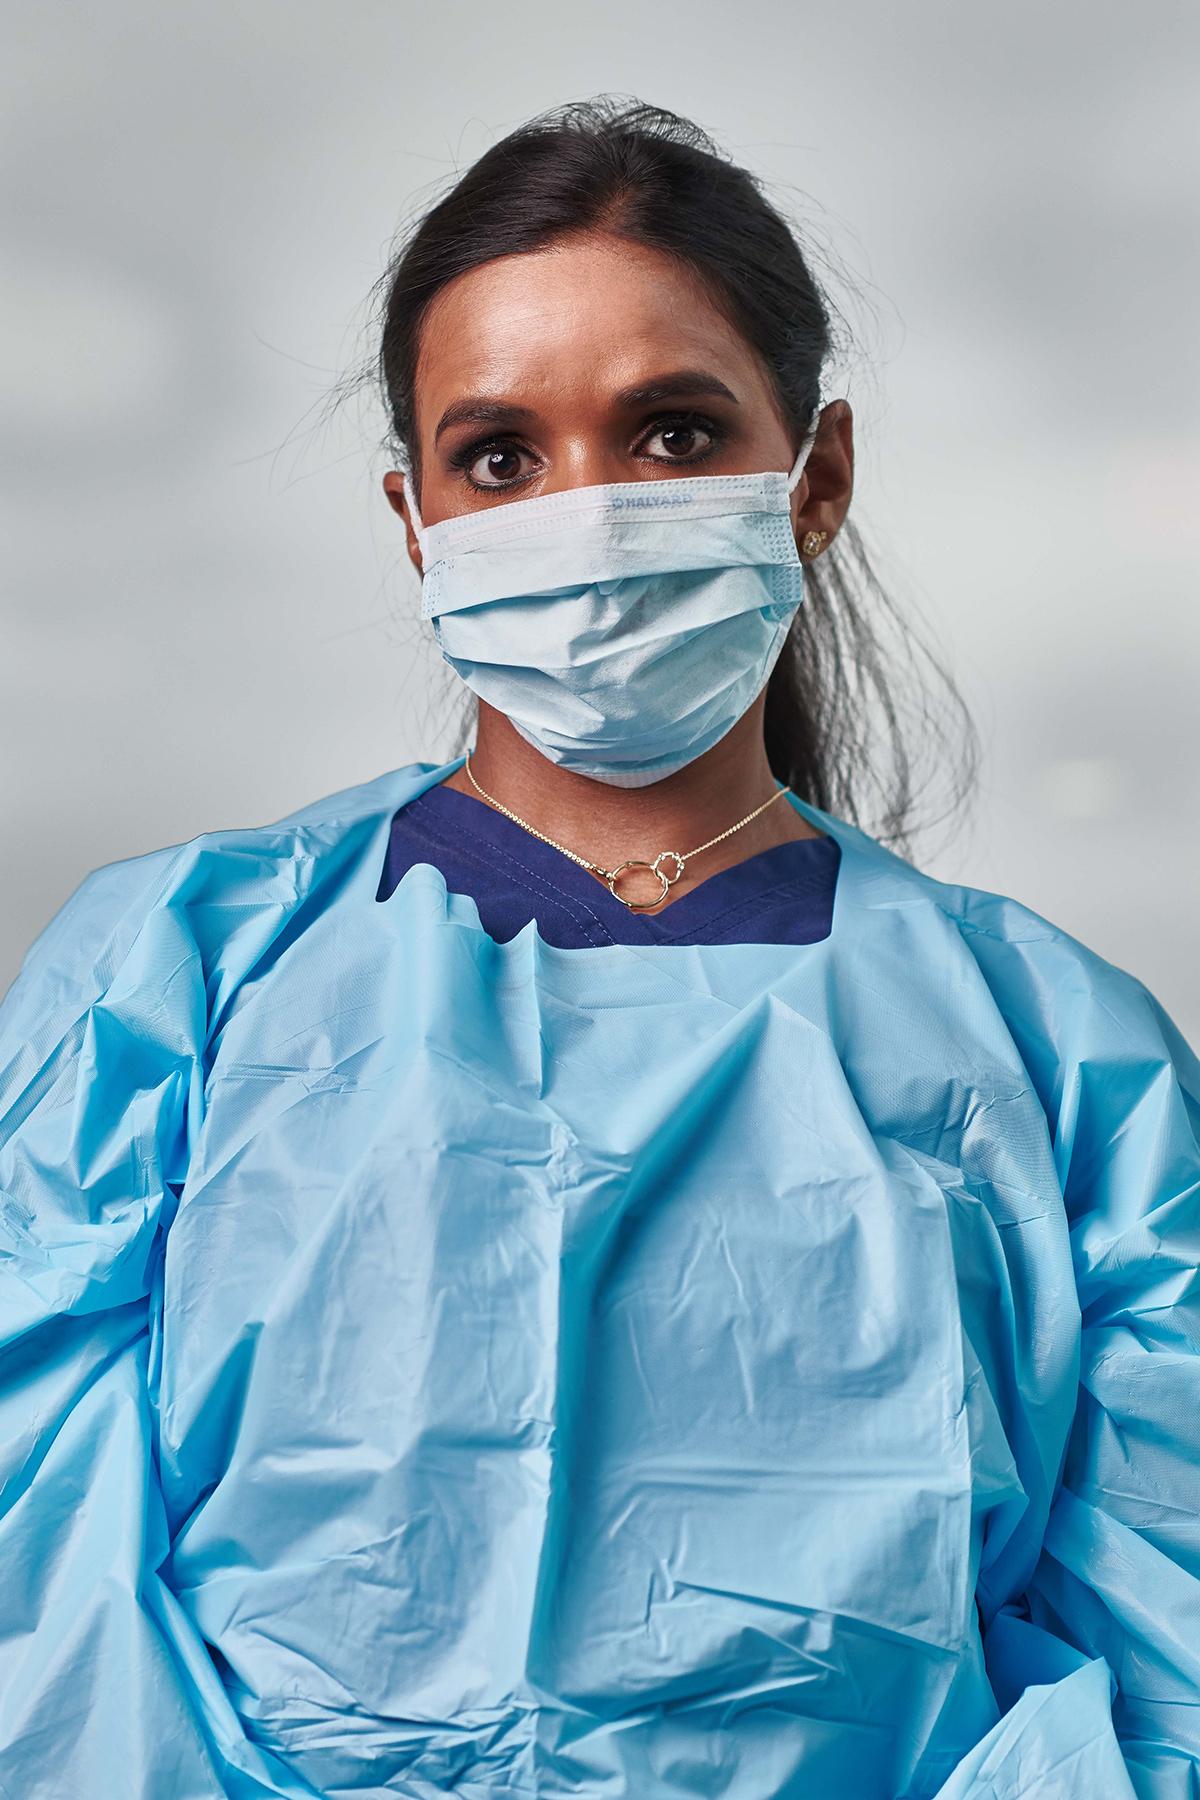 UTSW COVID-19 nurse